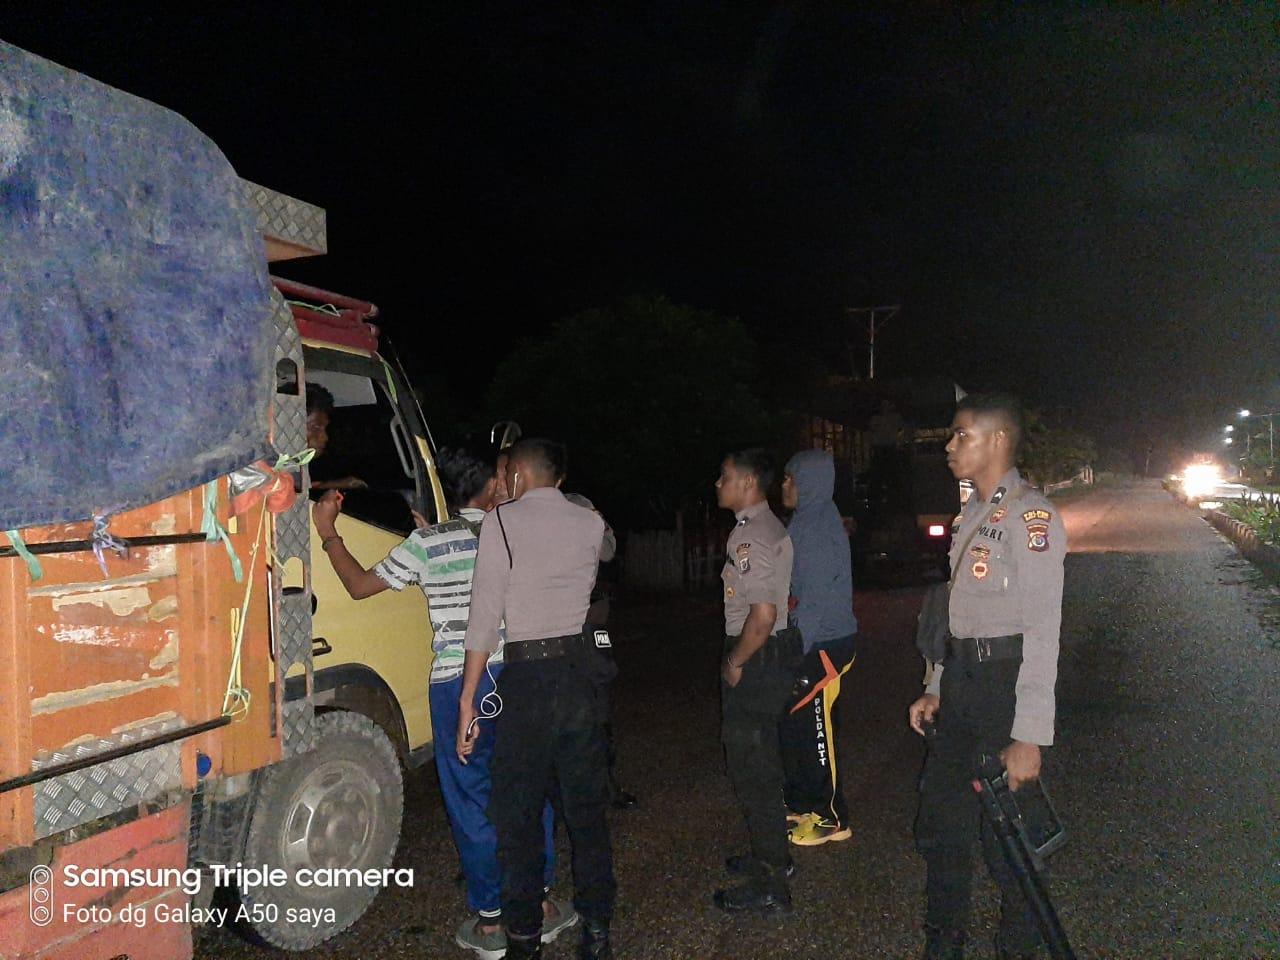 Pantau Situasi Kamtibmas, Dalmas Ton 2 Gelar Patroli Malam Hingga Subuh